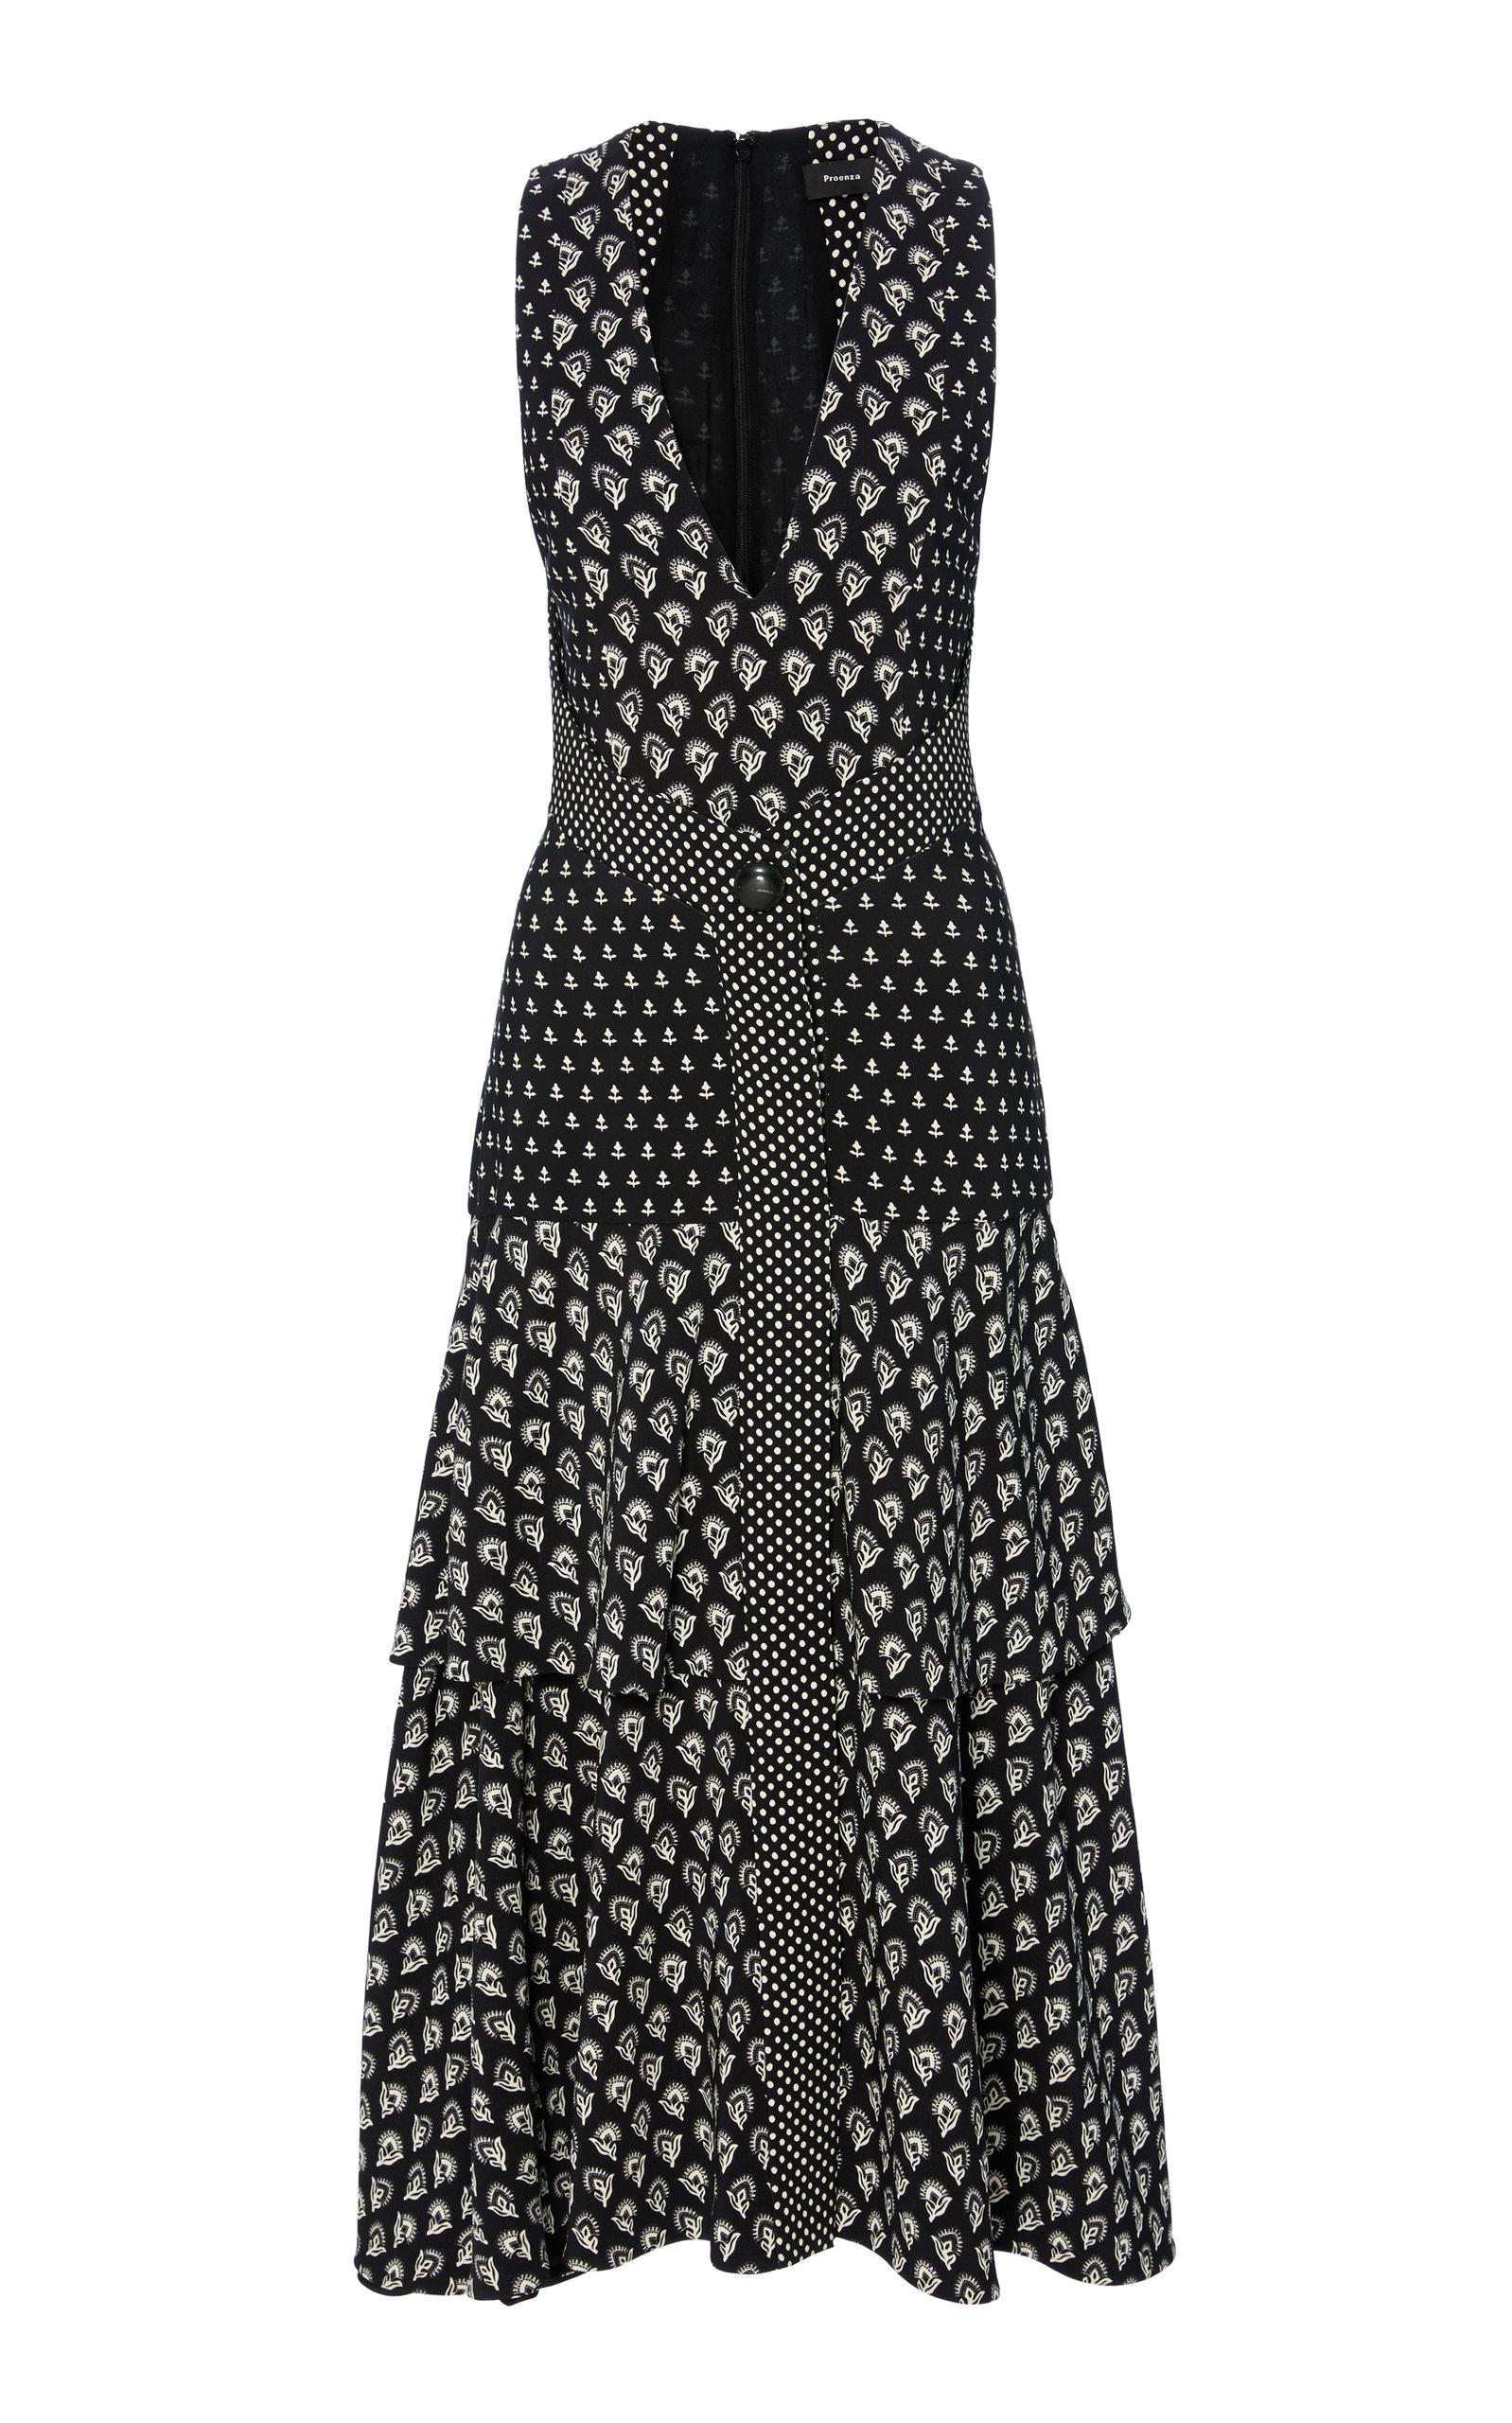 Block Print Sleeveless V-Neck Dress